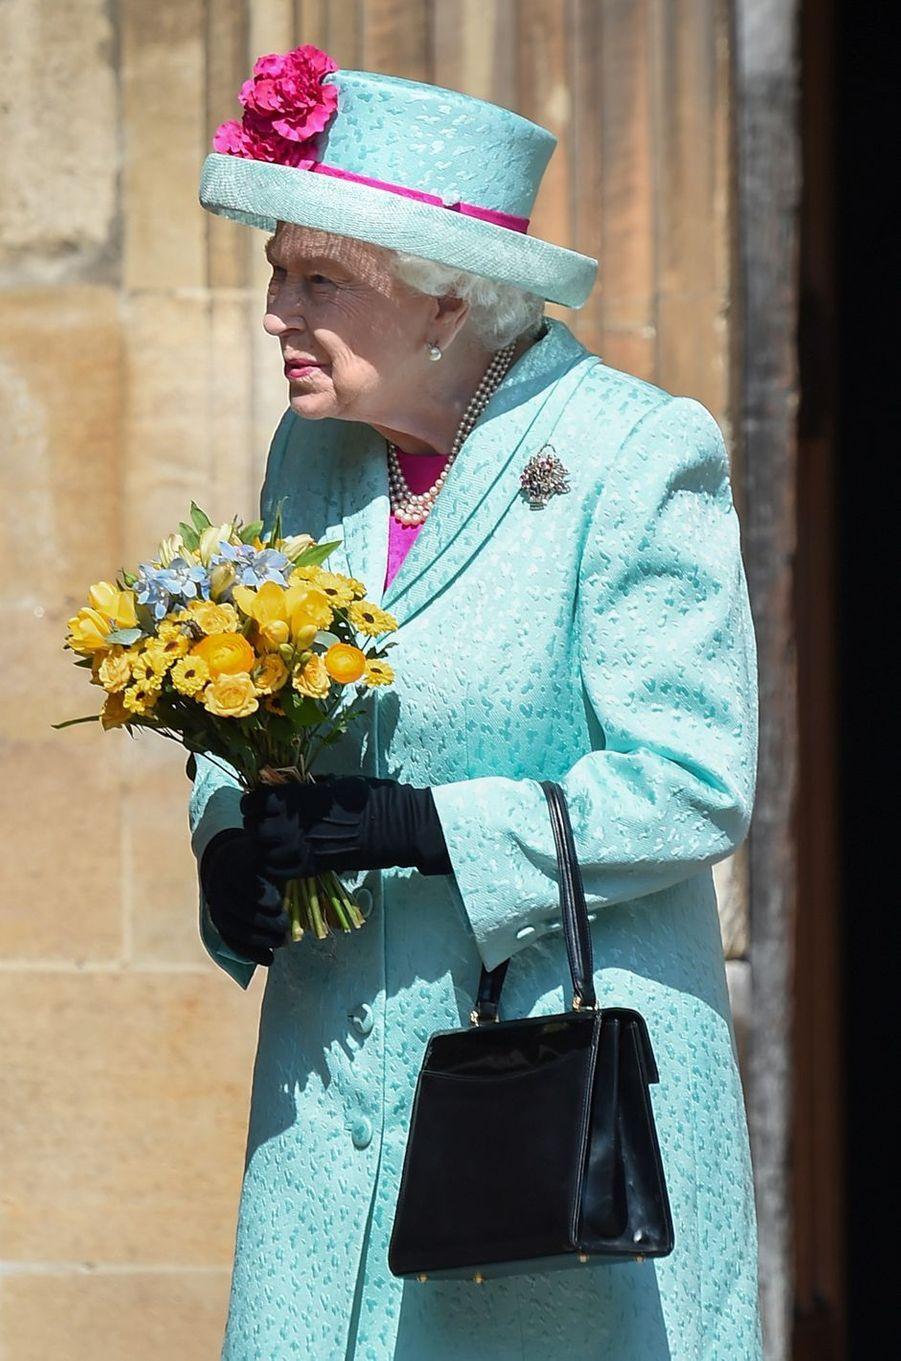 La reine Elizabeth II à Windsor, le 21 avril 2019